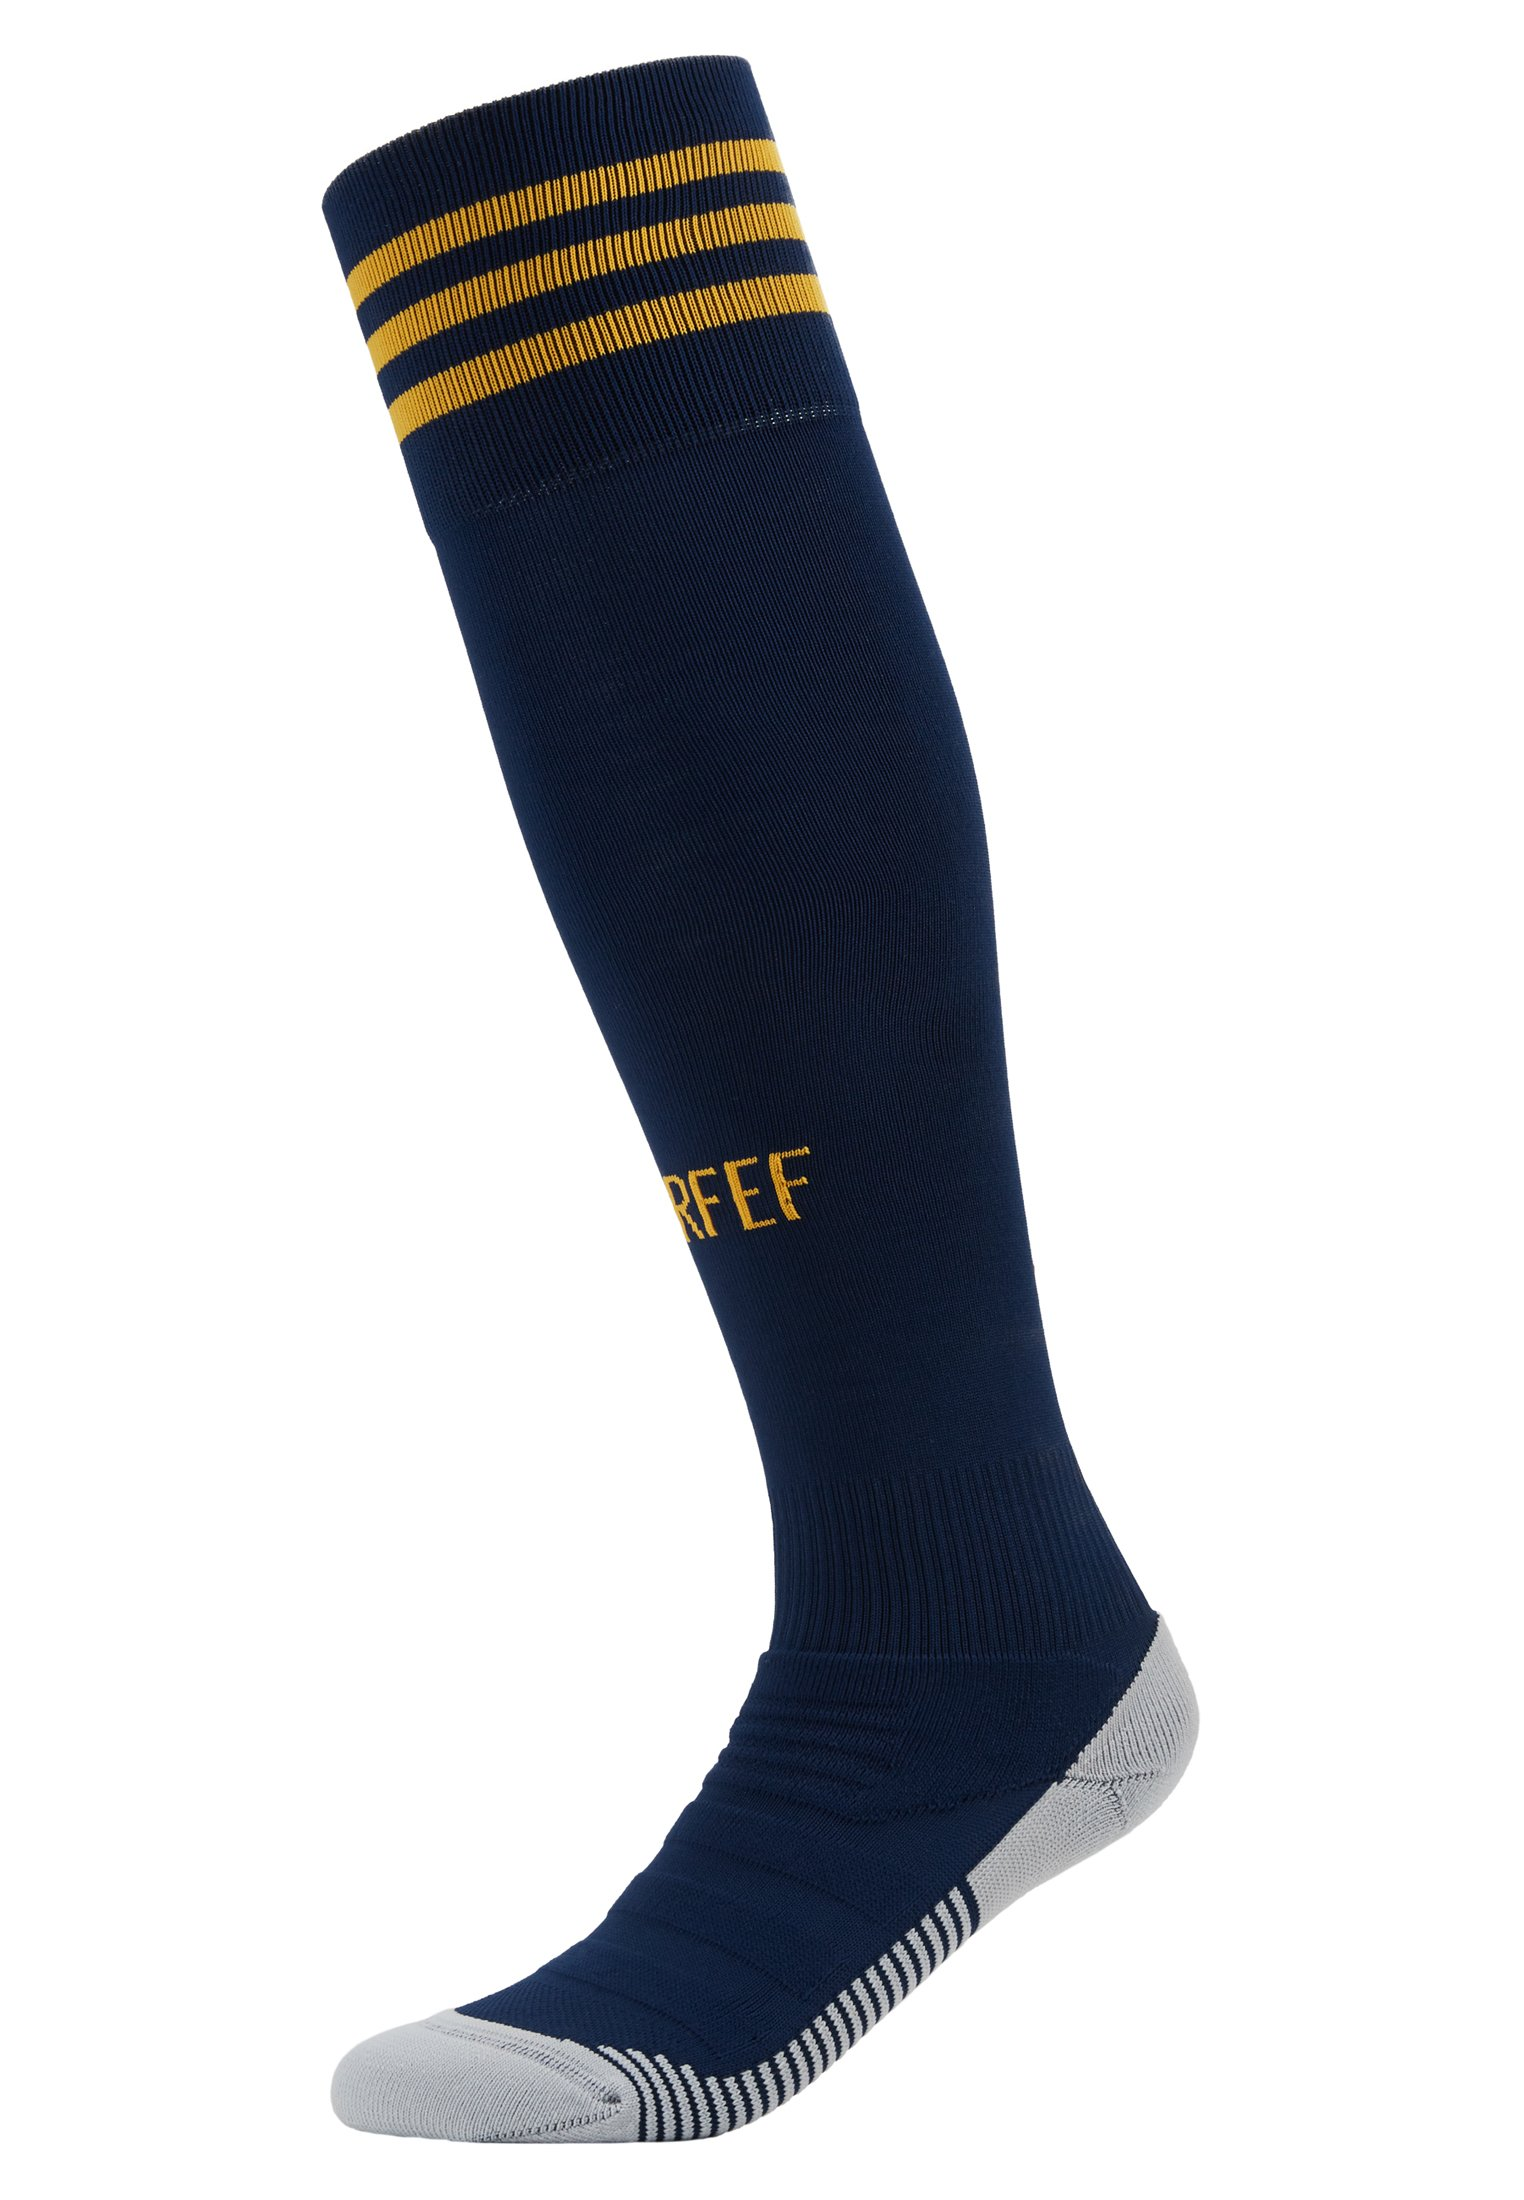 Femme SPAIN FEF HOME SOCKS - Chaussettes de sport